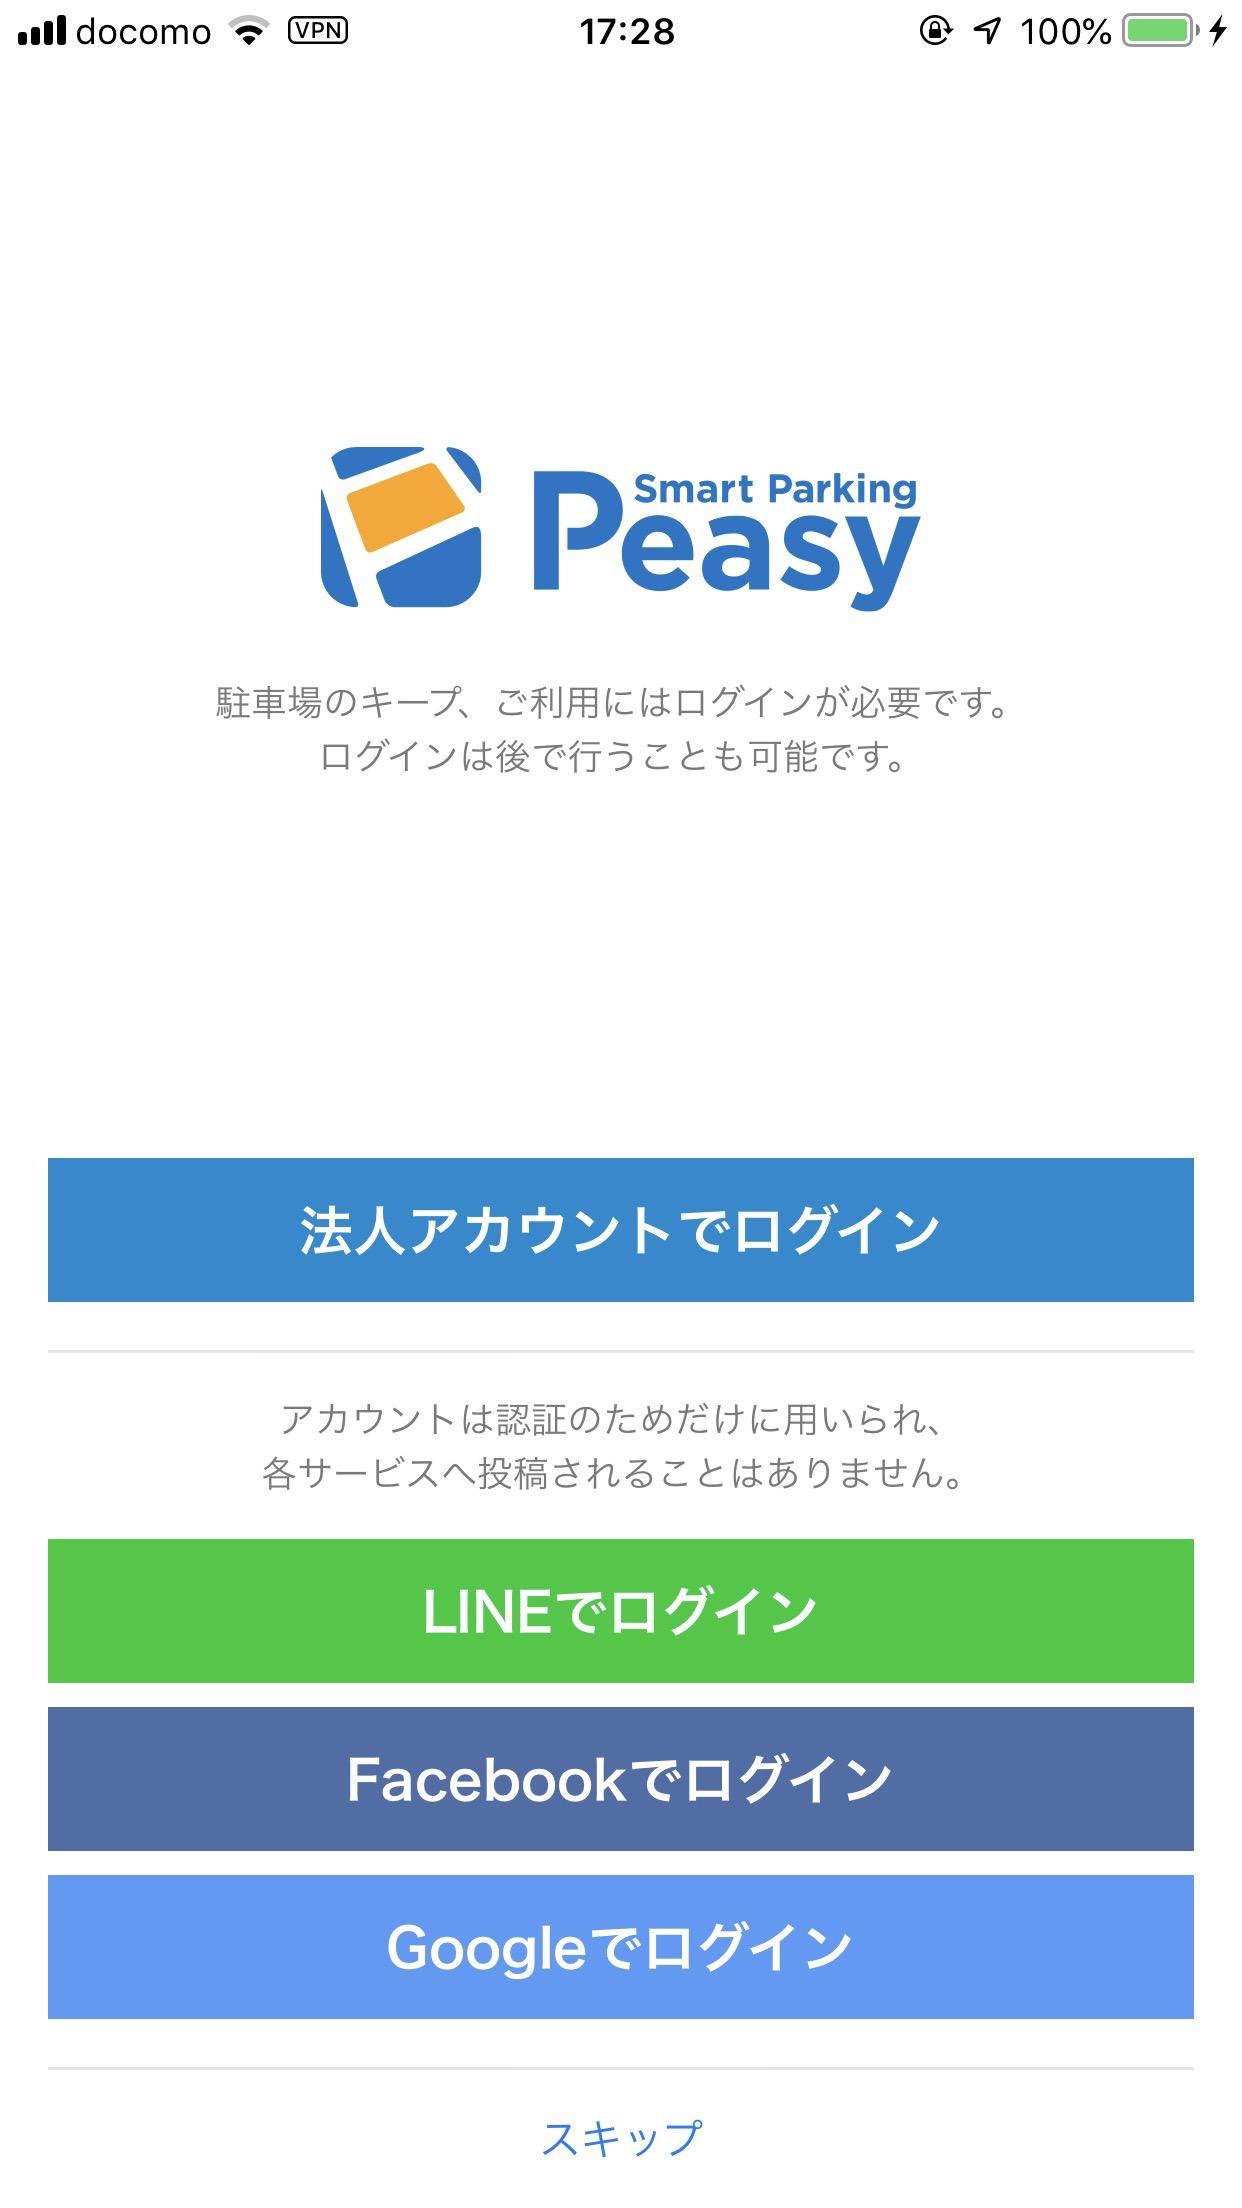 「Peasy(ピージー)」使い方 1